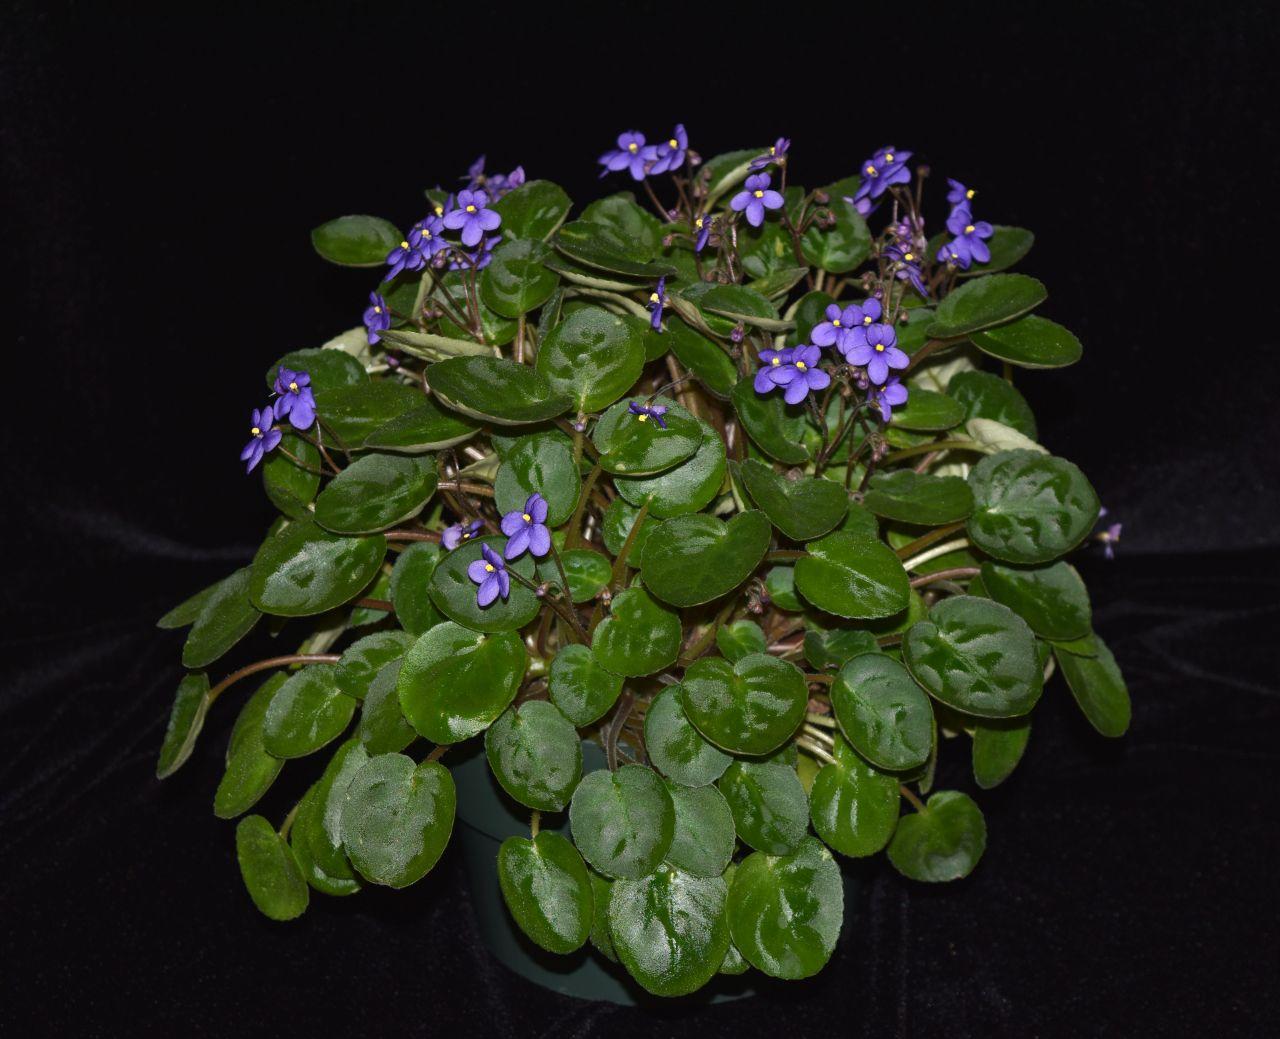 2017 Convention<br>Old World African Gesneriads in Flower<br>Class 20 – <i>Saintpaulia</i> species<br>BEST SAINTPAULIA SPECIES